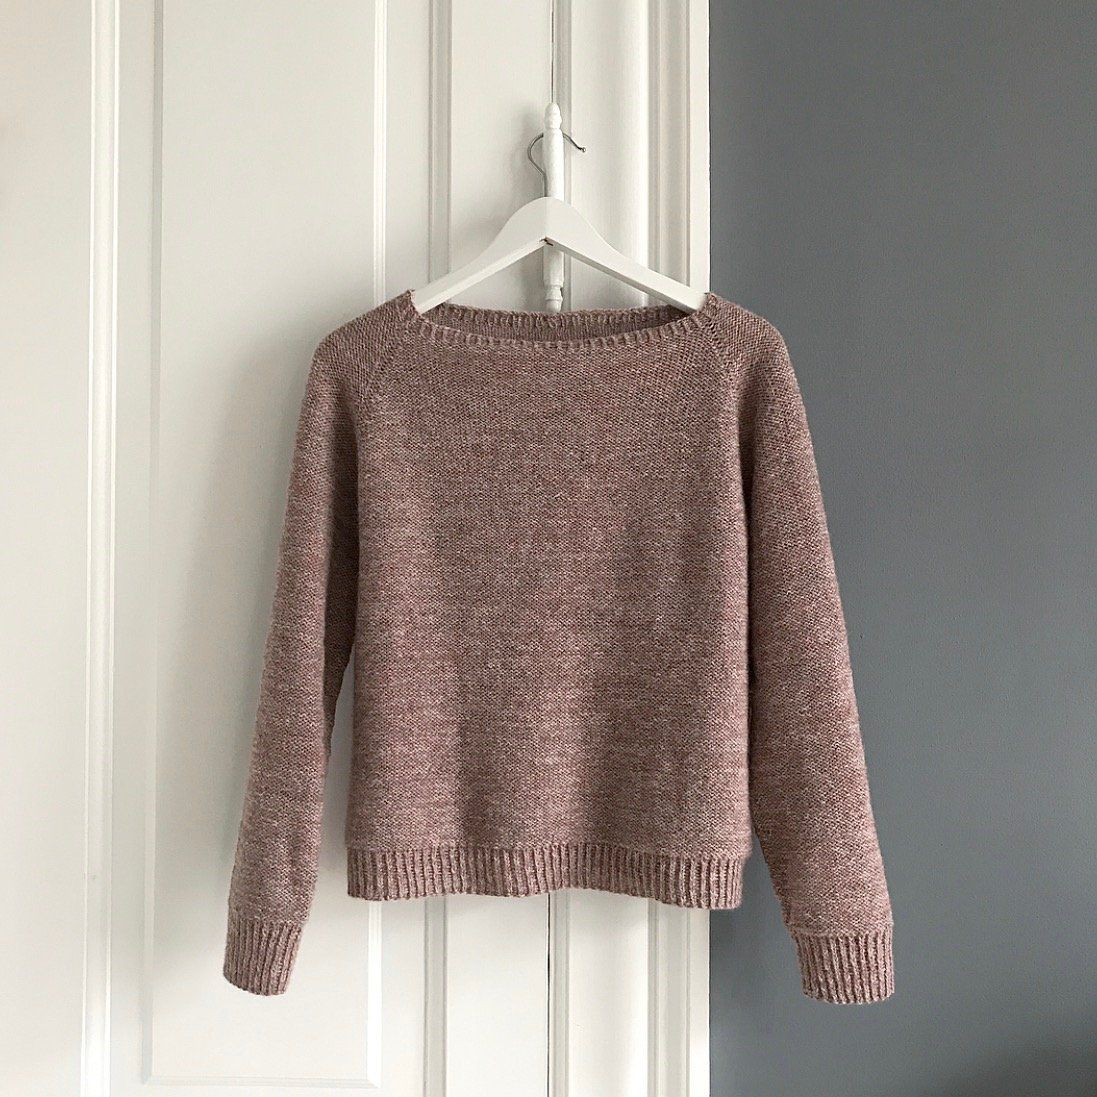 Elisabeth CAMILLA VAD | Sweatermønstre, Sweater